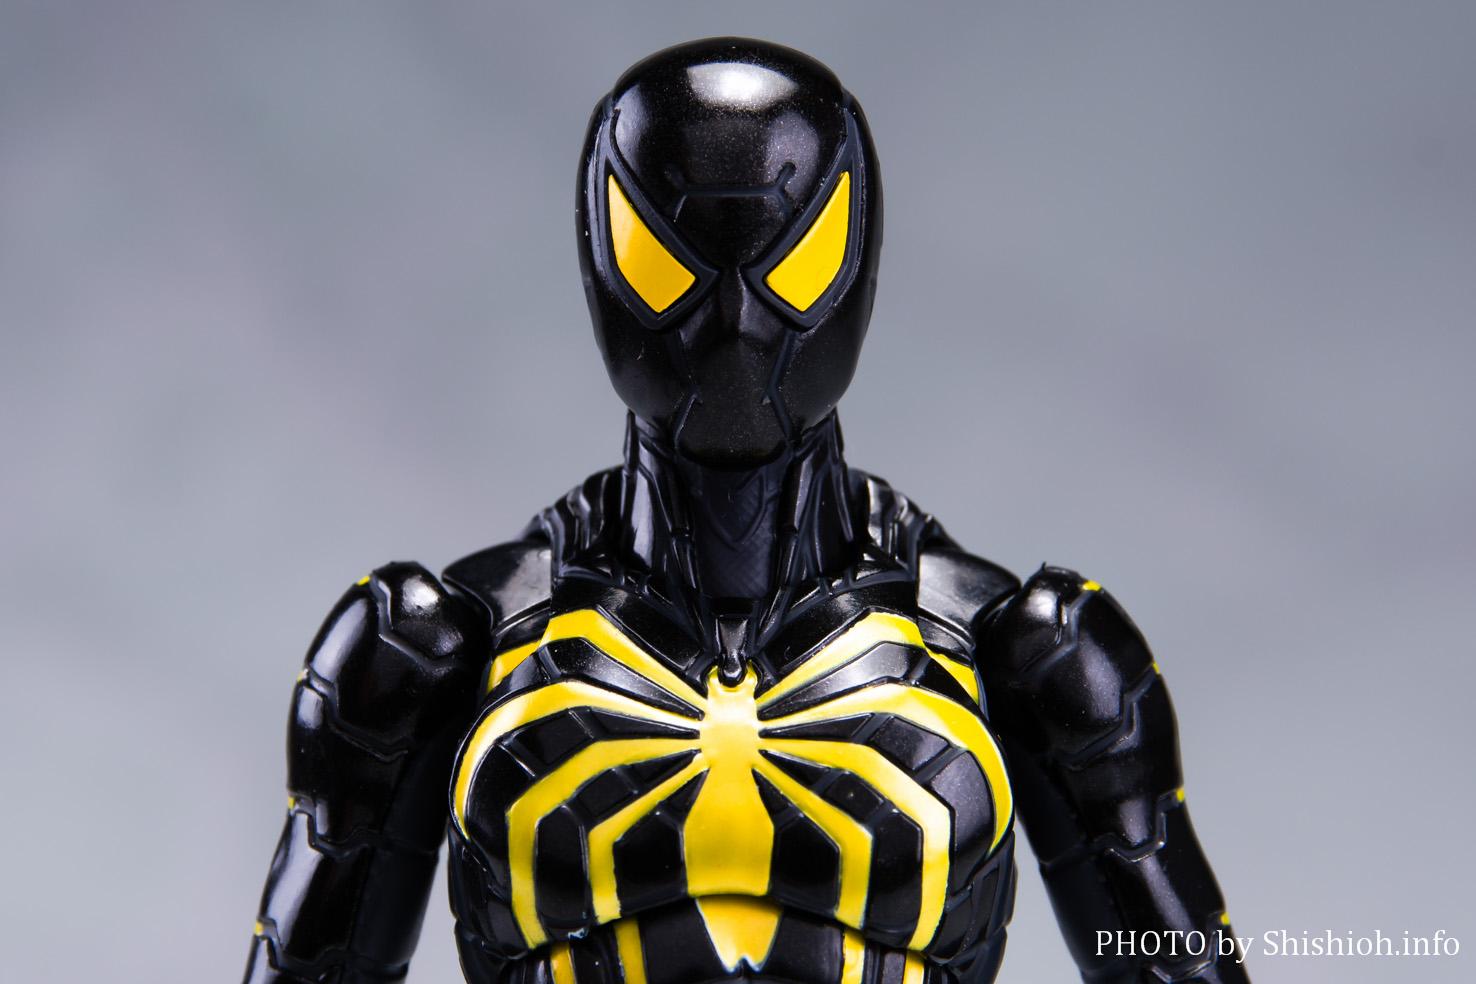 S.H.Figuarts スパイダーマン アンチオック・スーツ